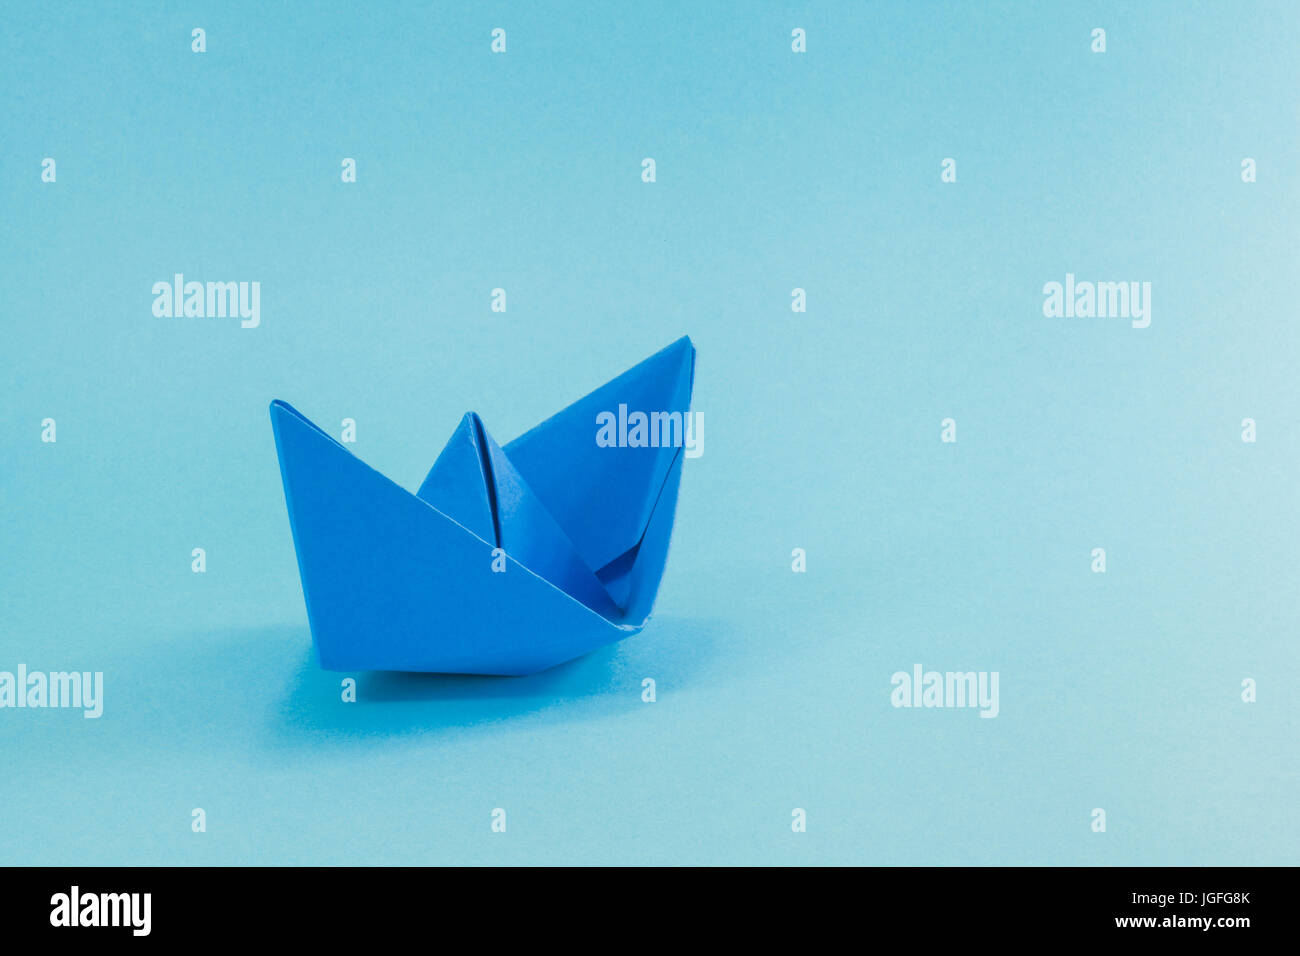 Bateau En Papier Bleu Cyan Sur L Arriere Plan Photo Stock Alamy